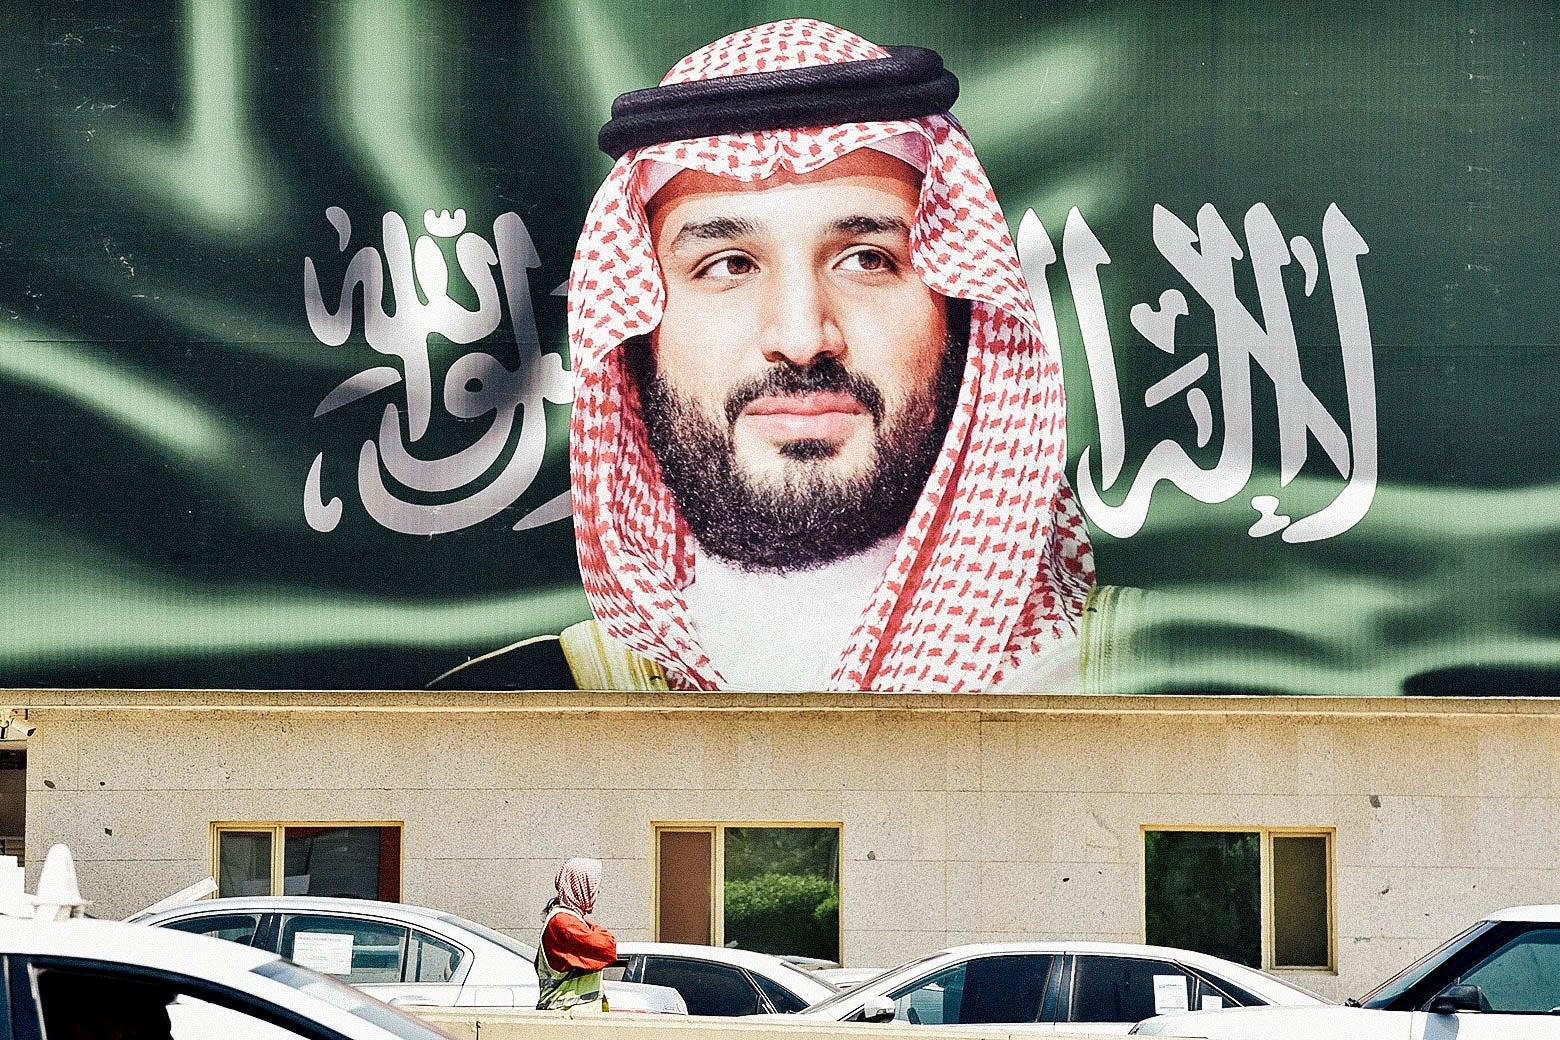 A billboard with a portrait of Saudi Crown Prince Mohammed bin Salman.